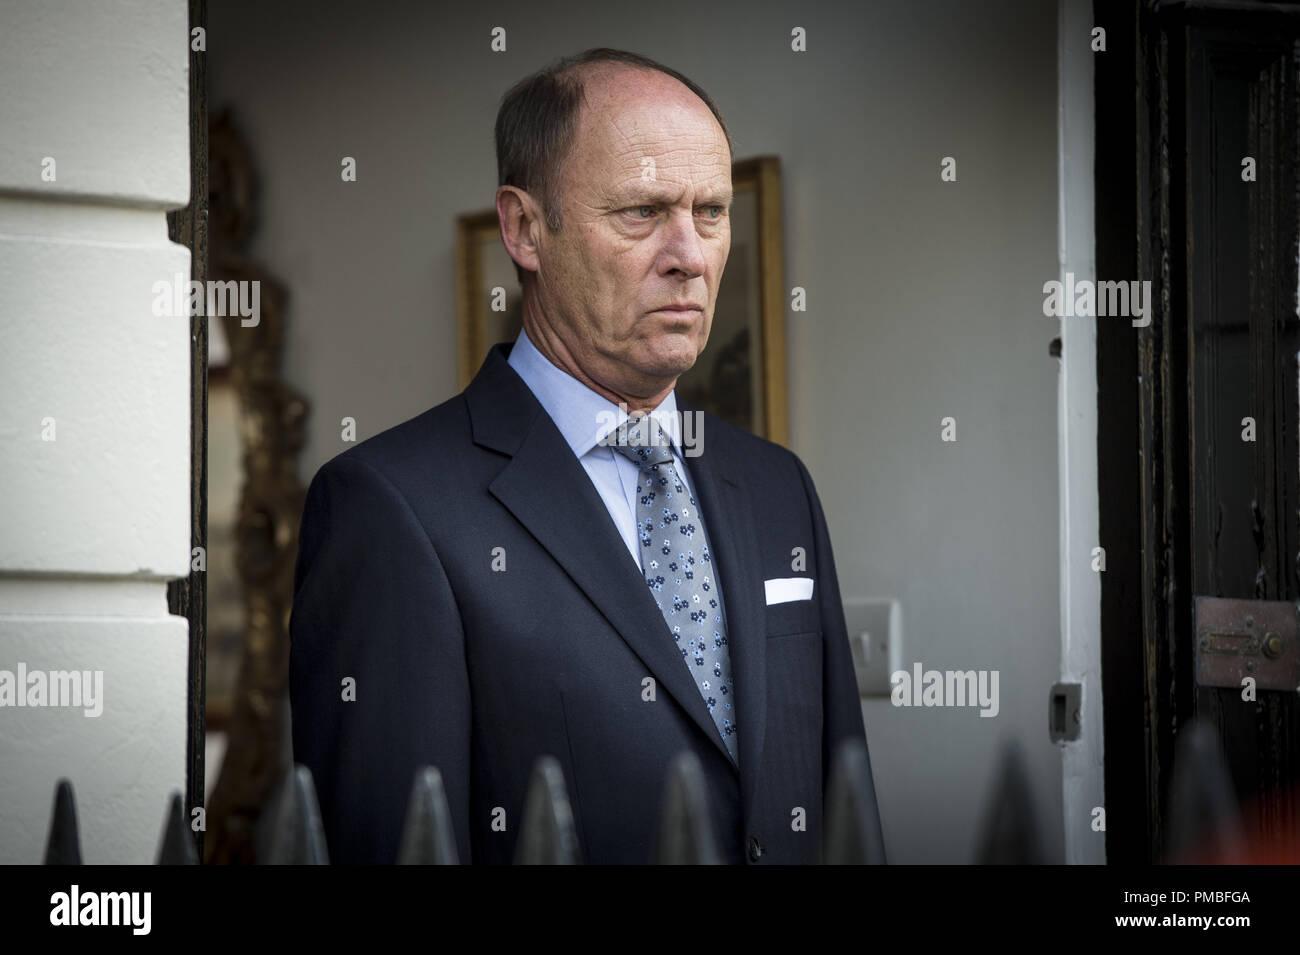 Patrick Malahide, 'Luther' Season 4 (2015) BBC Worldwide - Stock Image